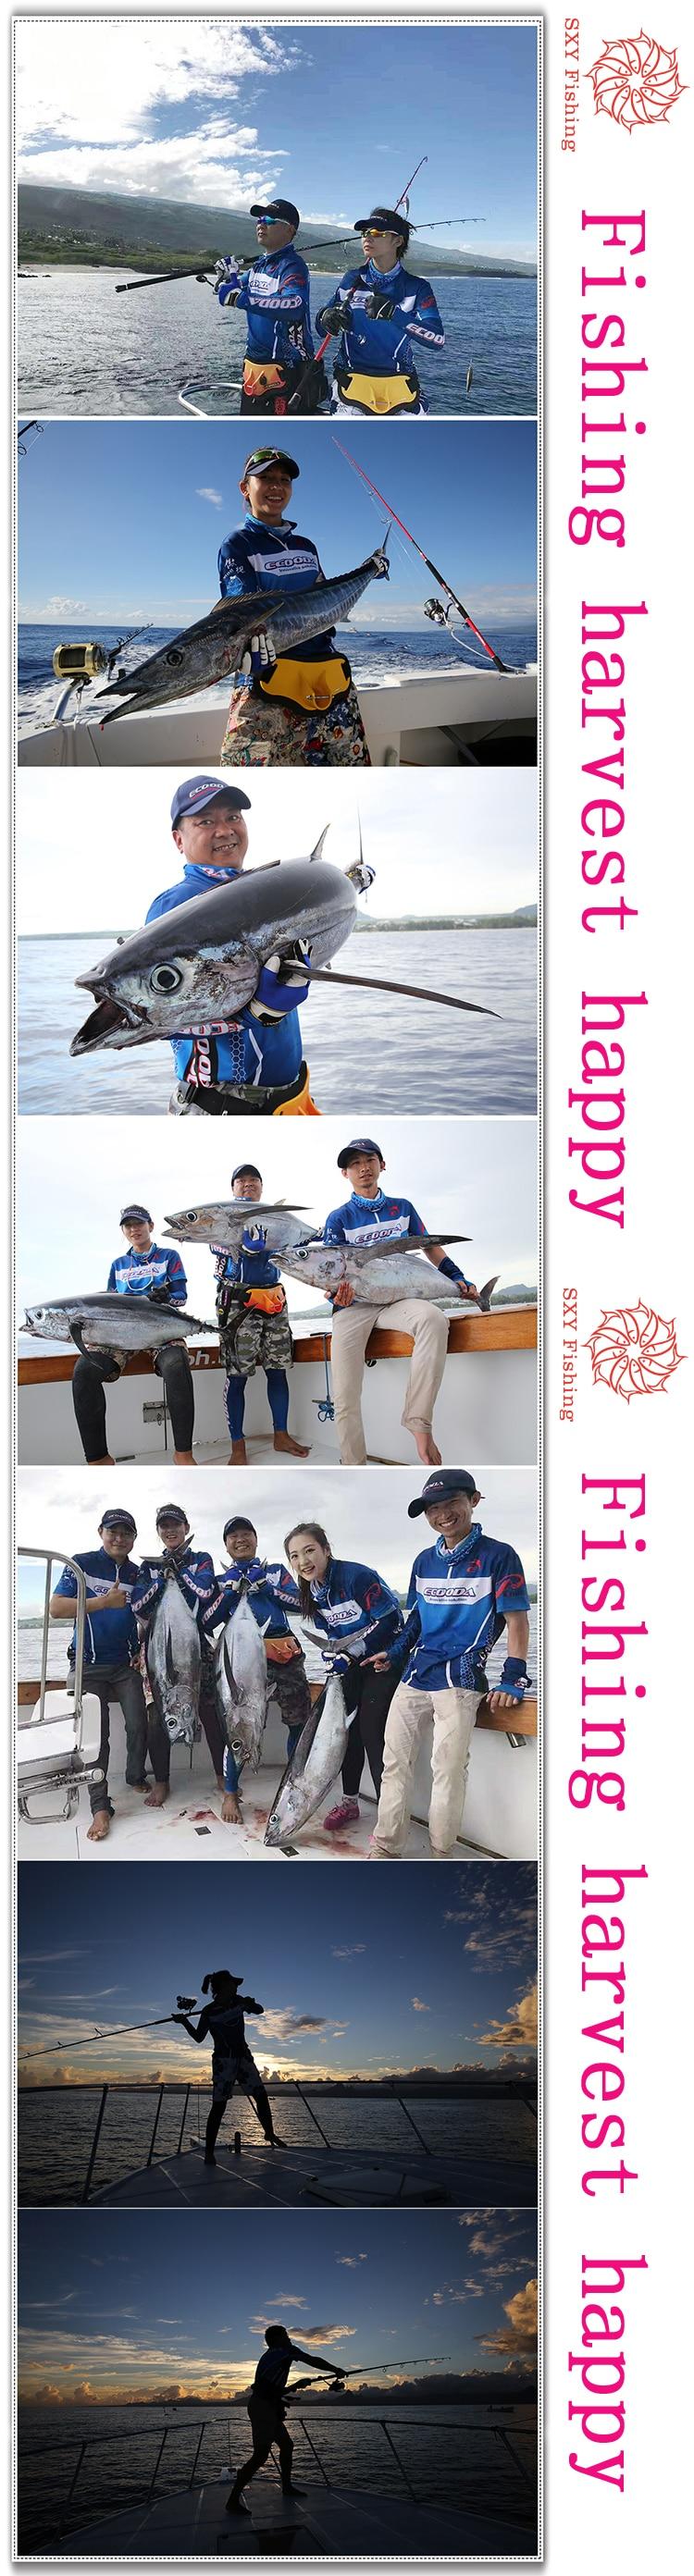 Low-Profile força 6 kg isca Carretel de Pesca carretel